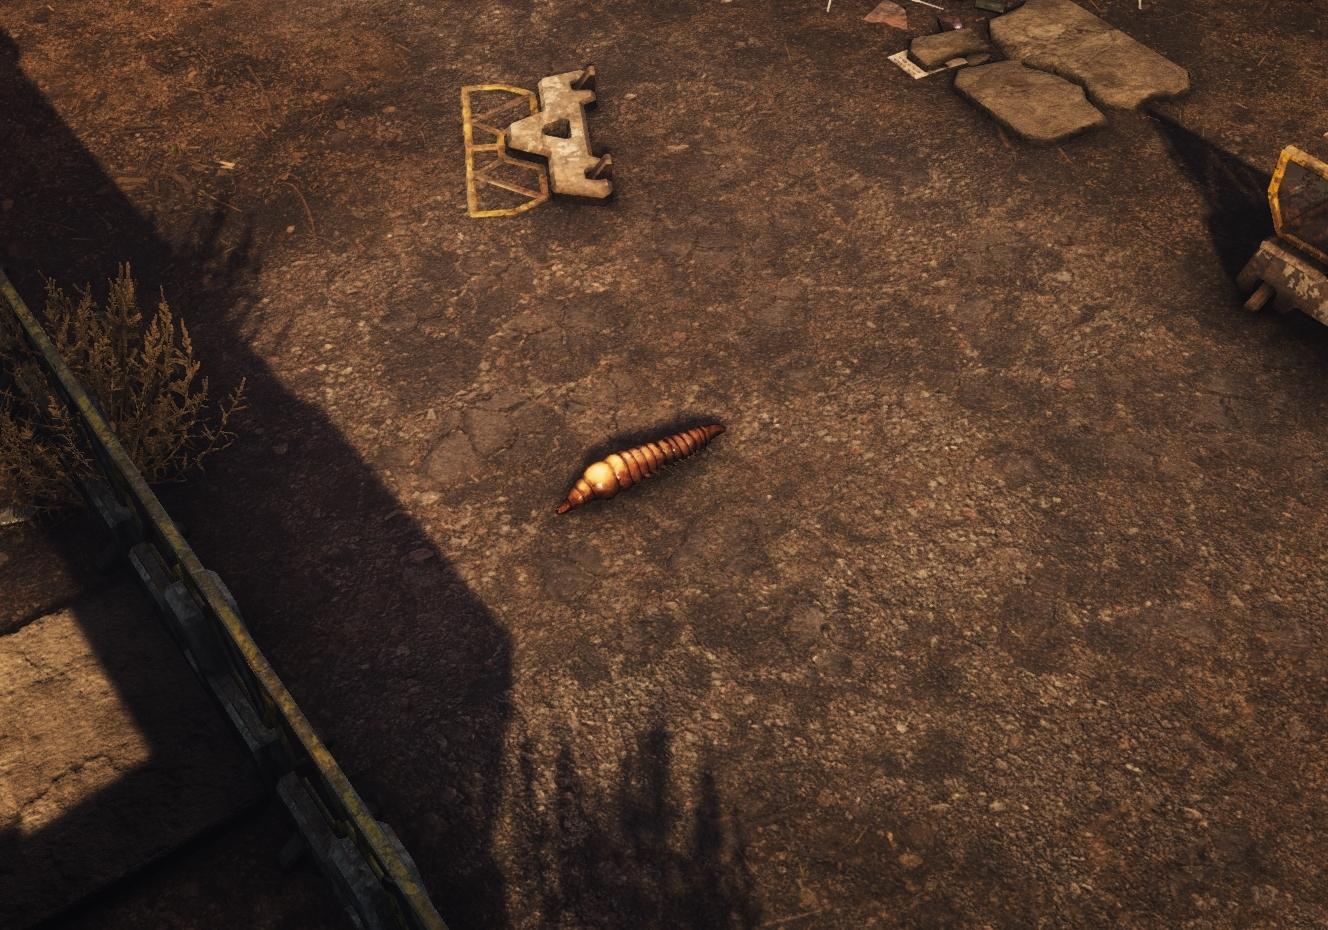 A Fireworm